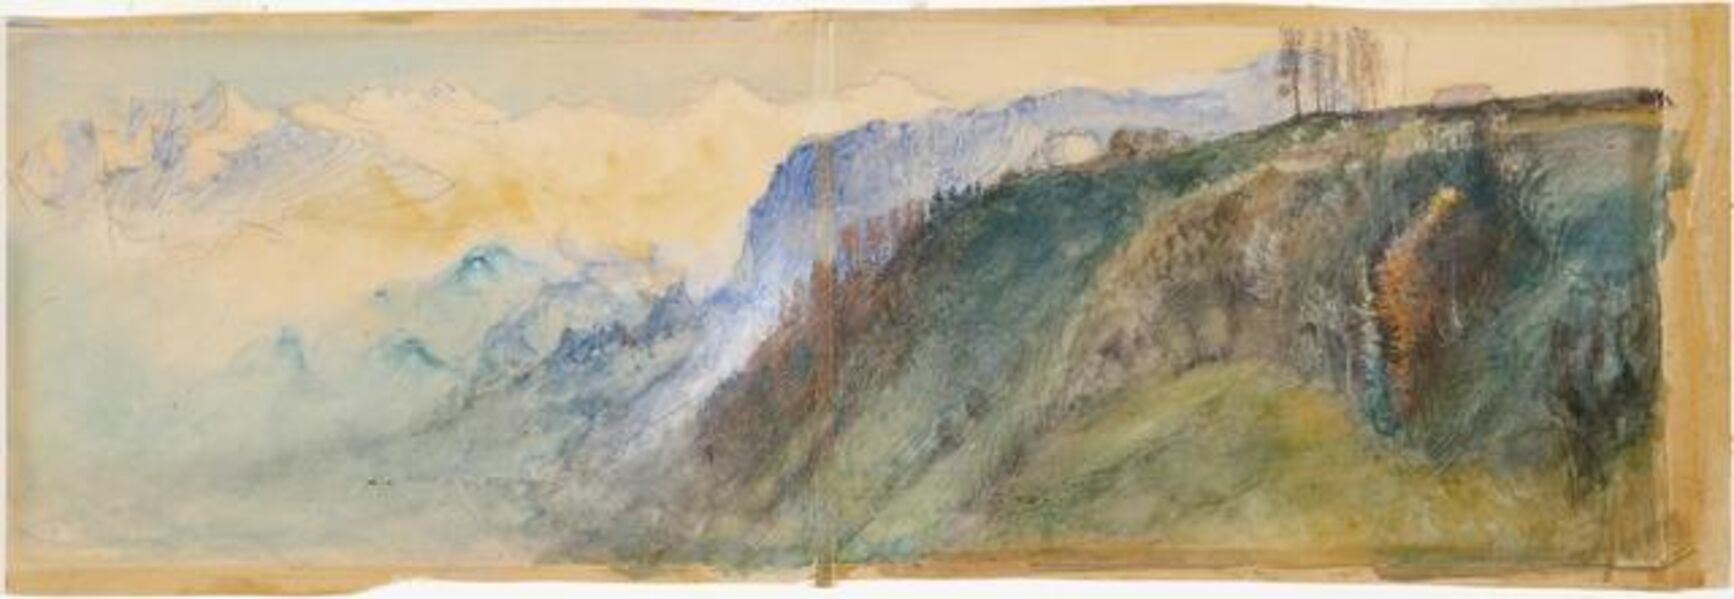 John Ruskin, 'Bernese Oberland', 1866